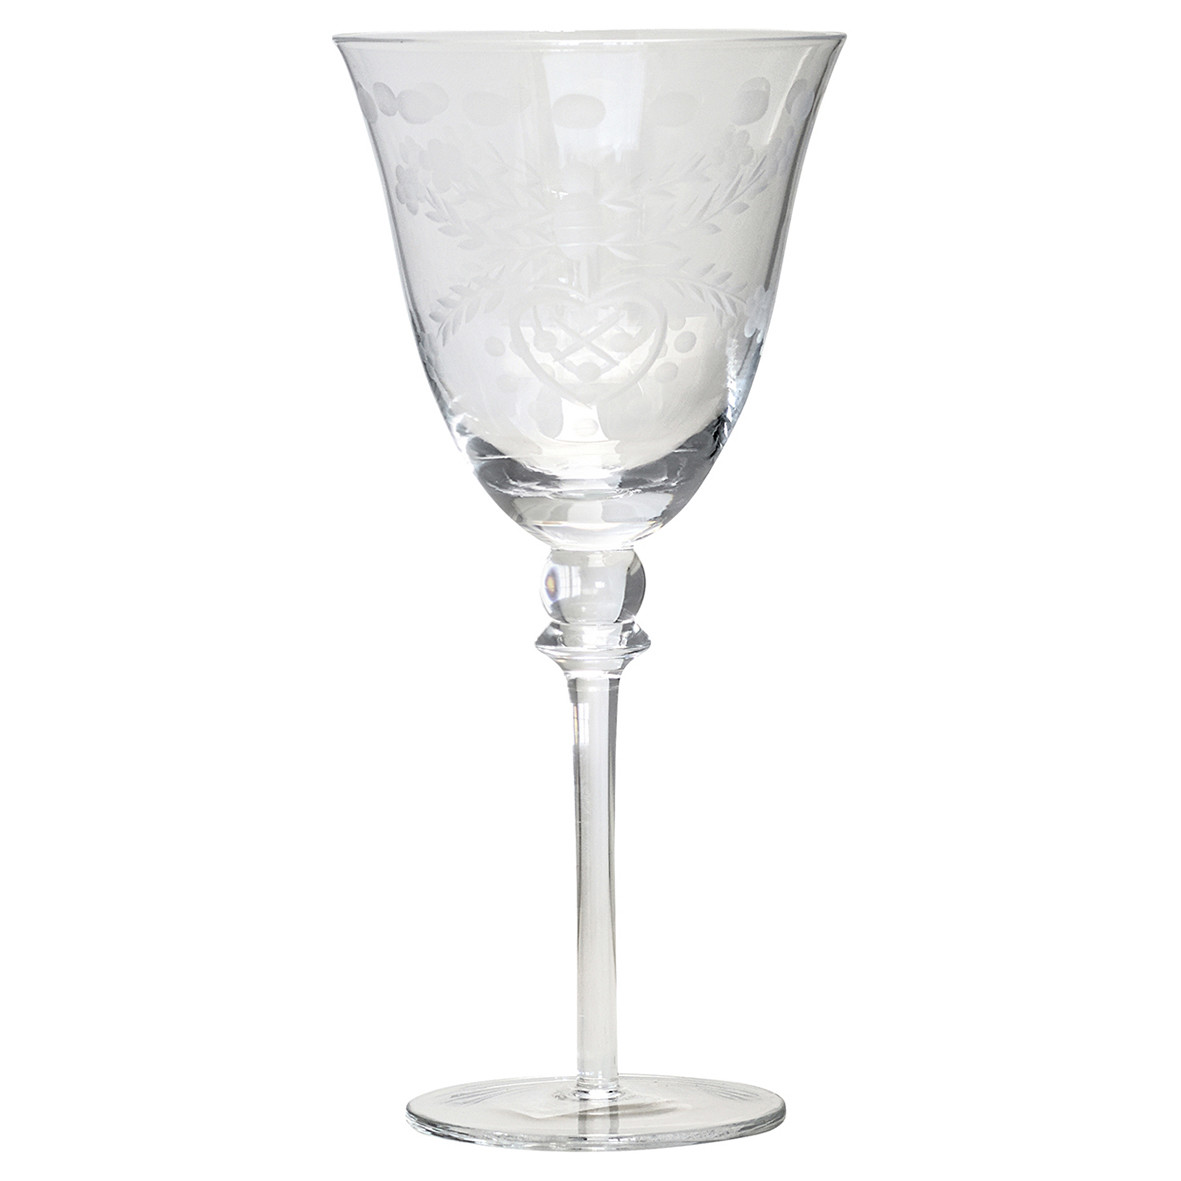 Weinglas - Greengate H 22cm